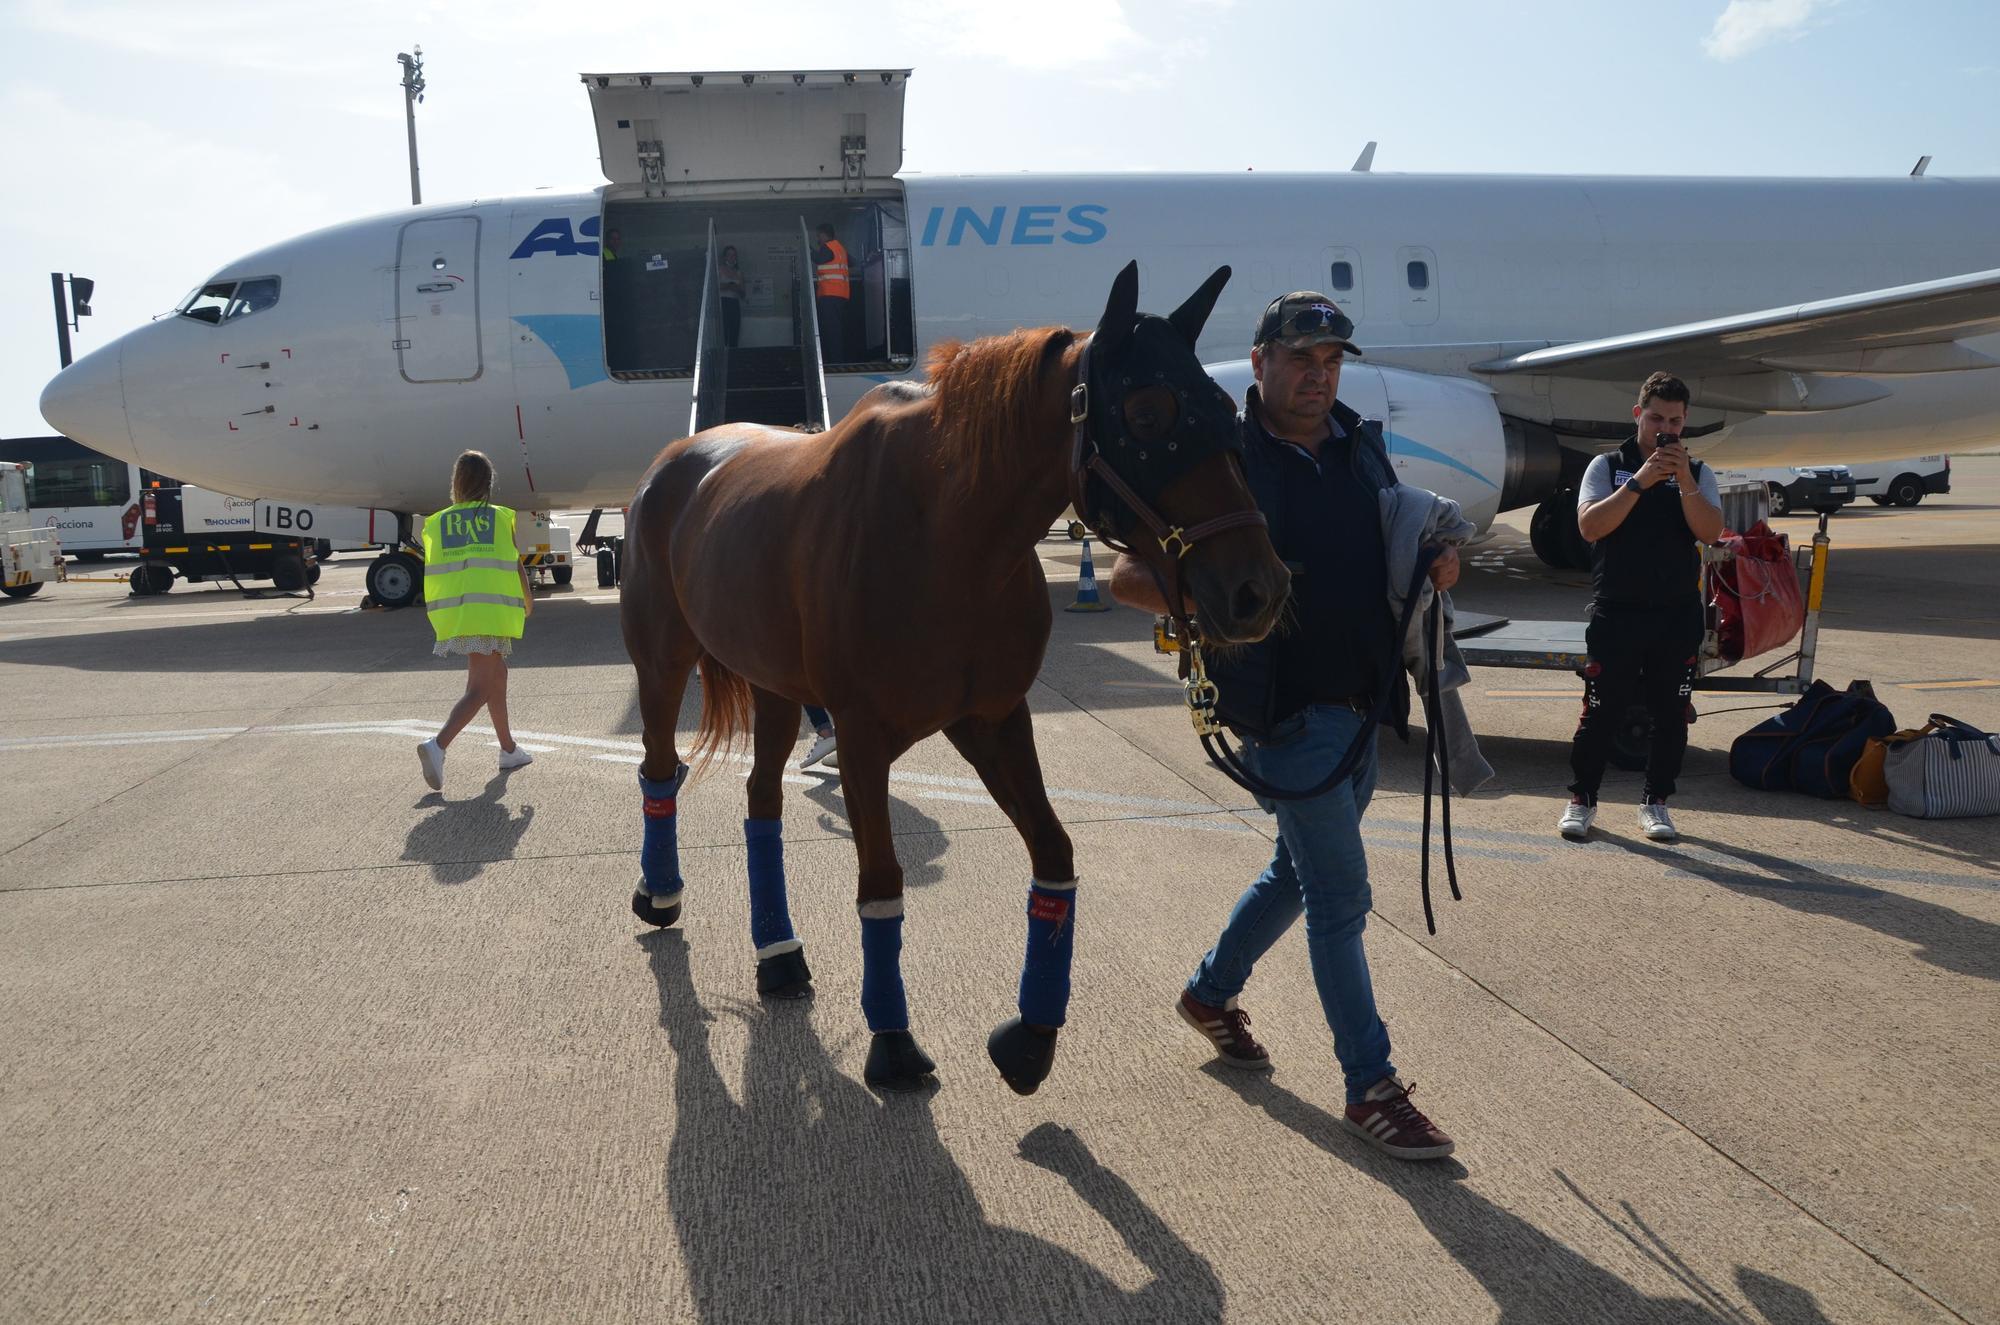 La tropa gala del 'Tour Europeo' aterriza en Palma